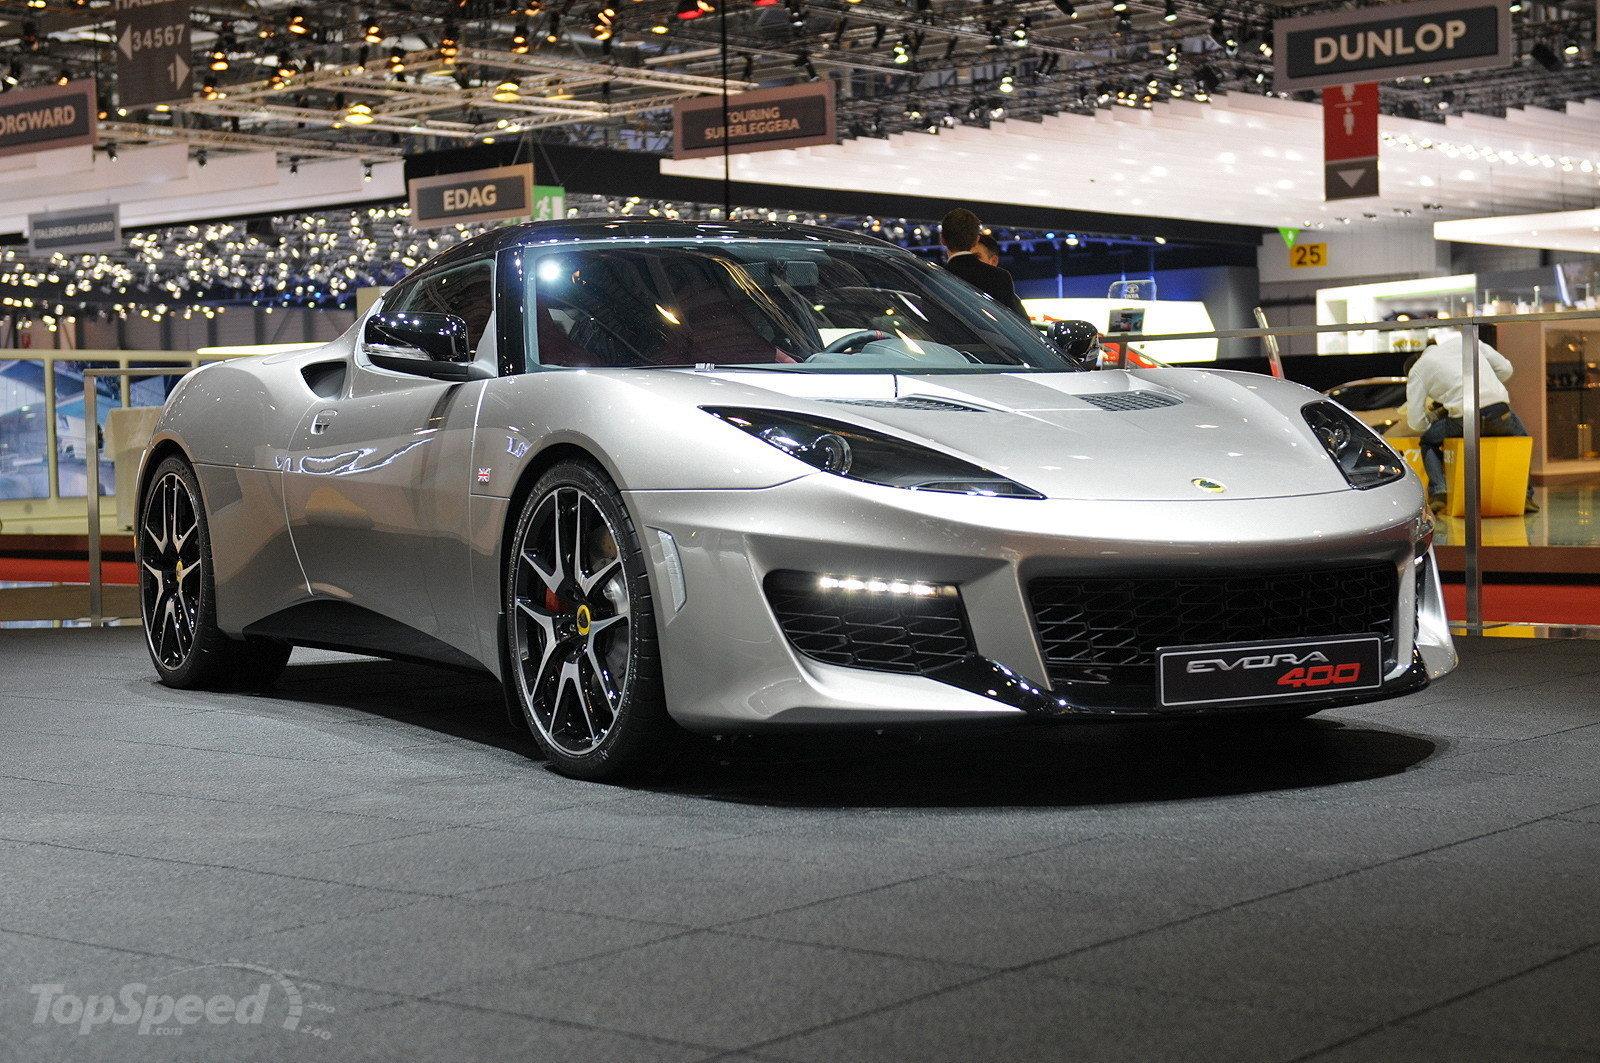 Next Design: 2016 Lotus Evora 400